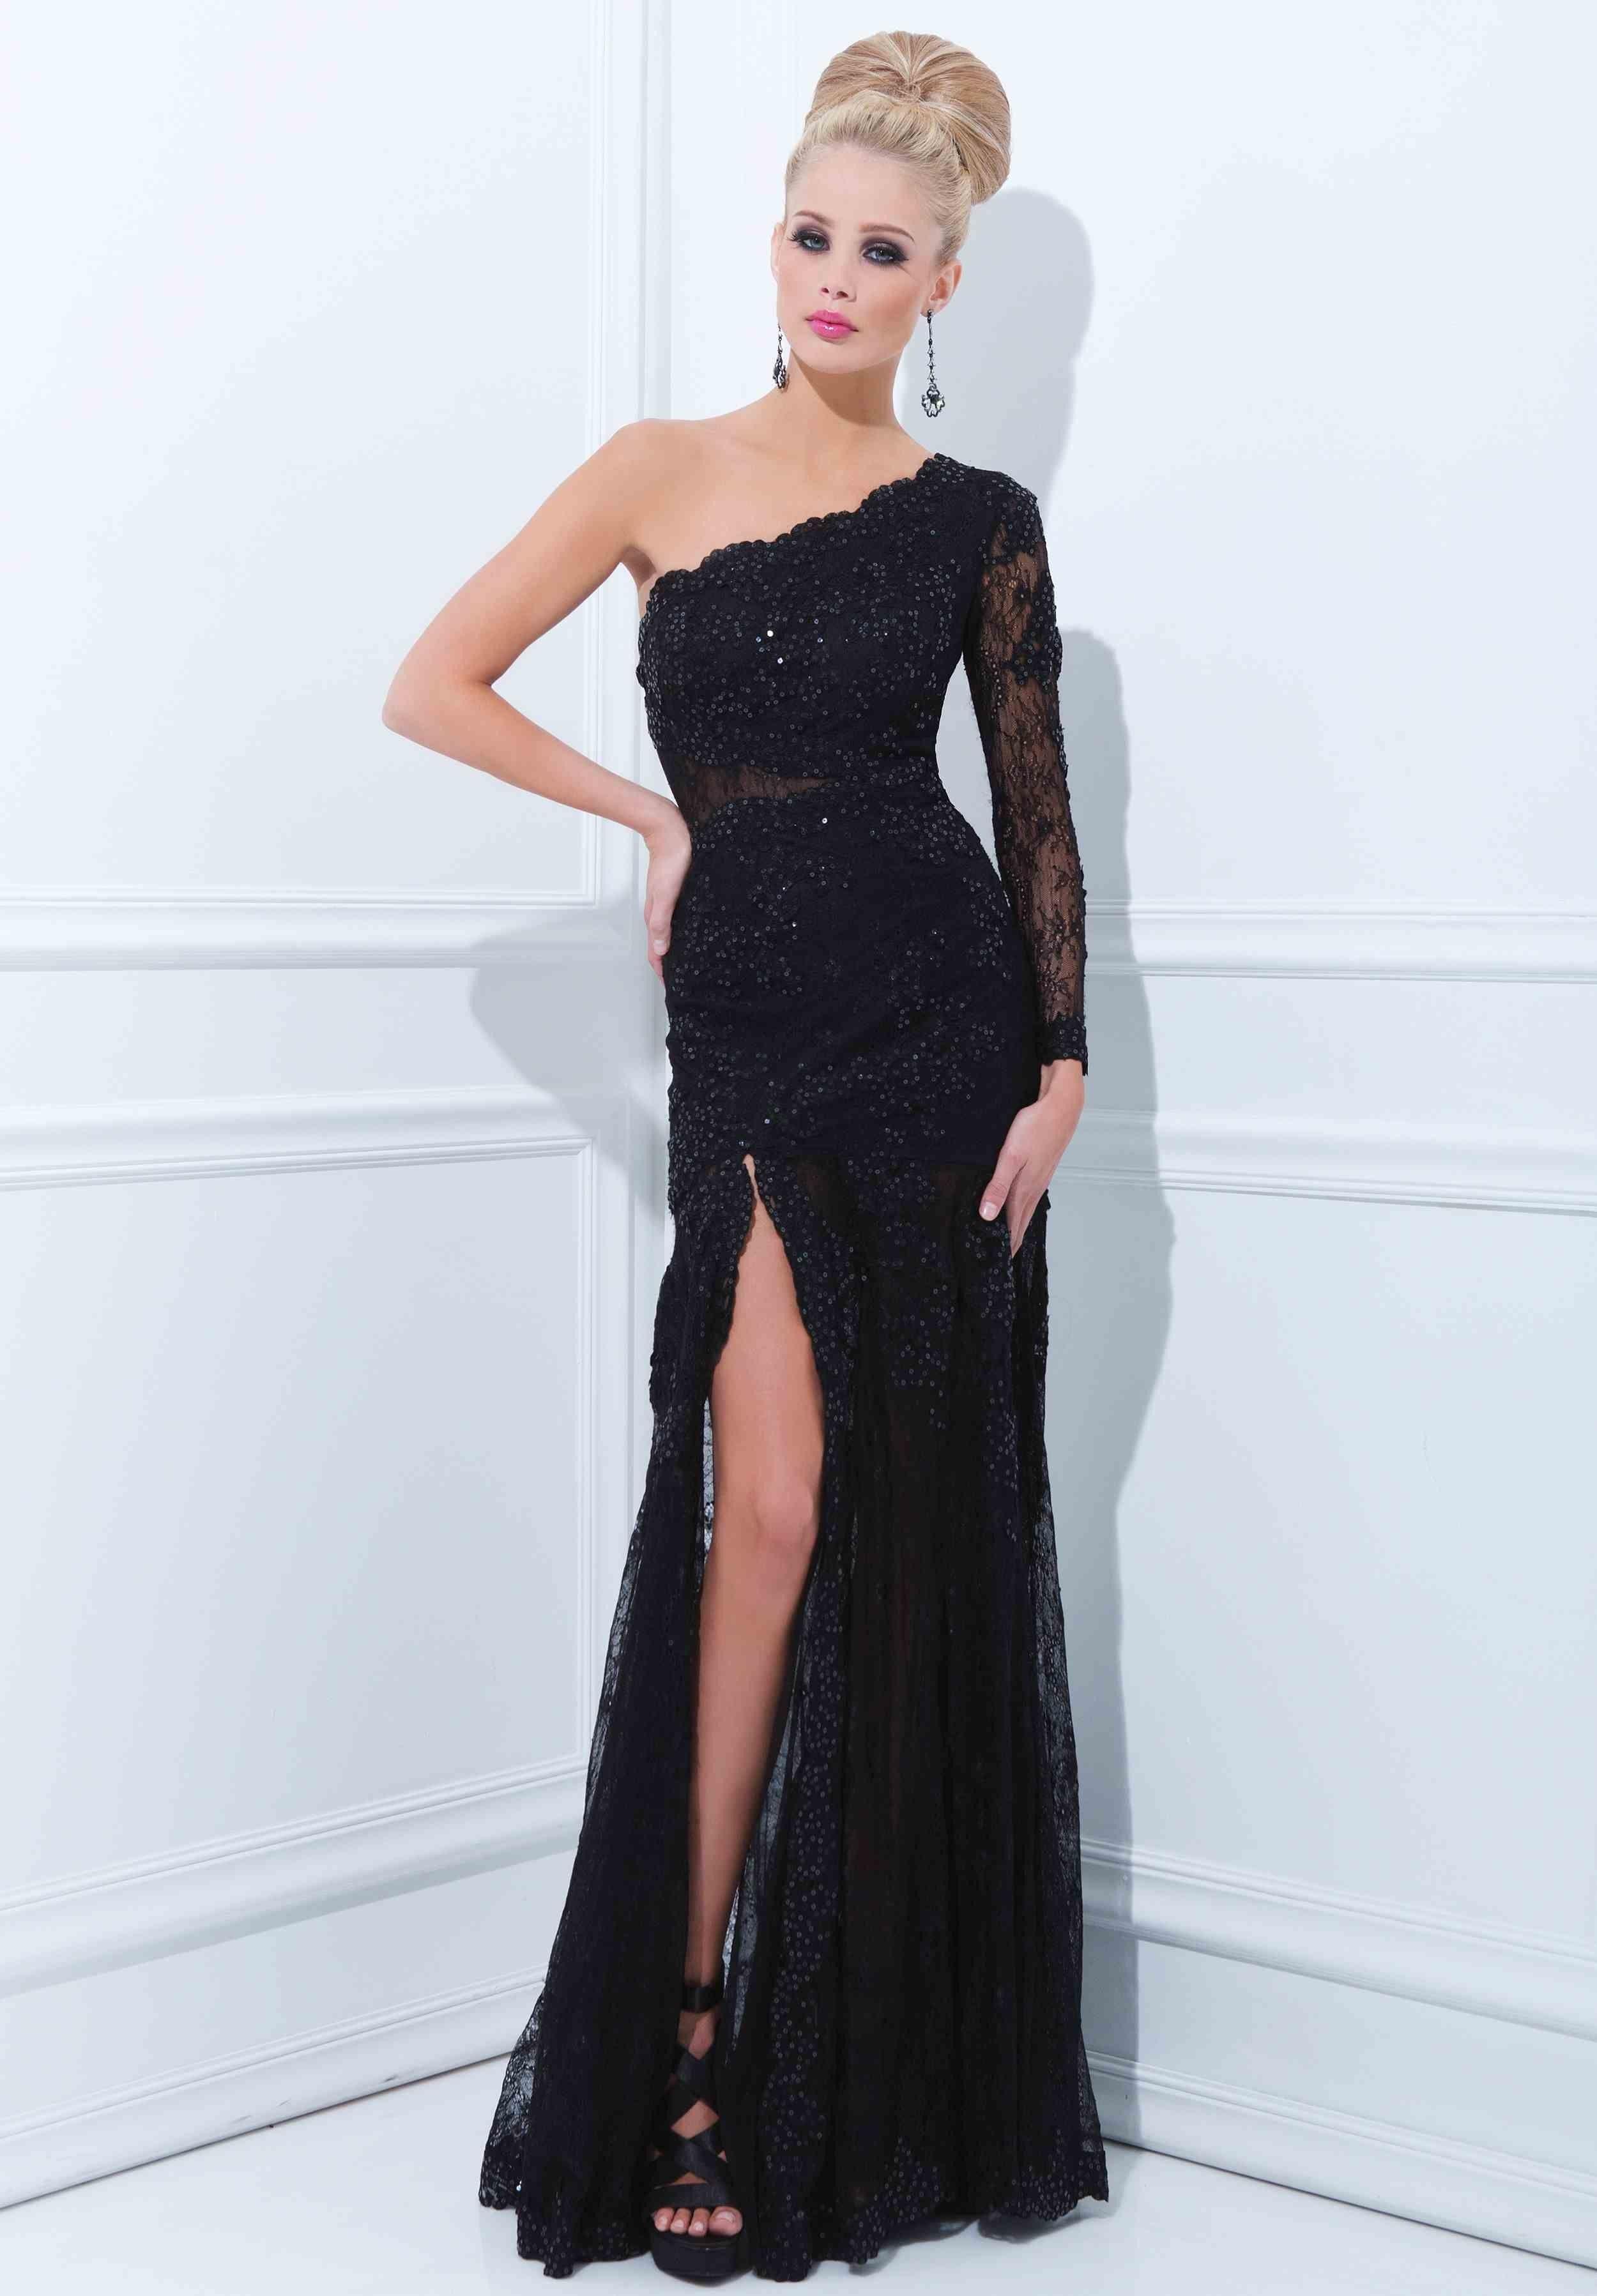 Beautiful Sheath / Column One-shoulder Floor-length 2014 New Style Prom Dress $239.99 Sheath/Column Prom Dresses